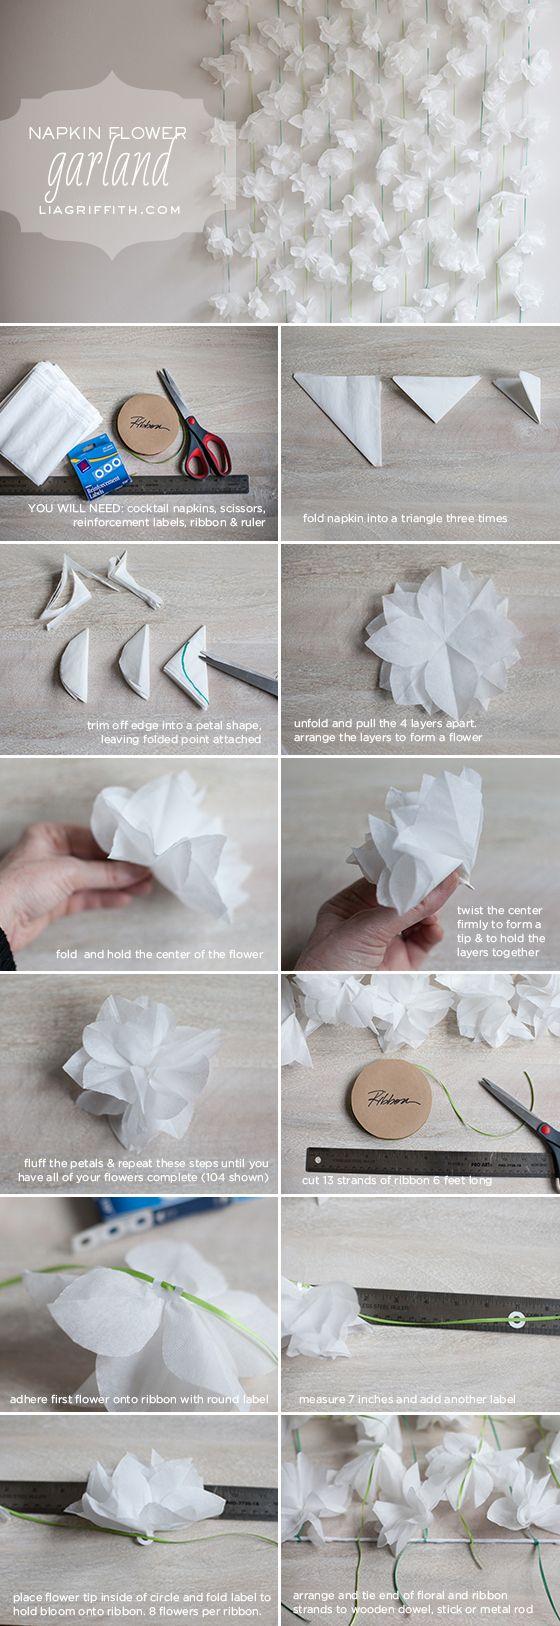 NapkinFlowerTutorial - guirlande fleur papier tuto